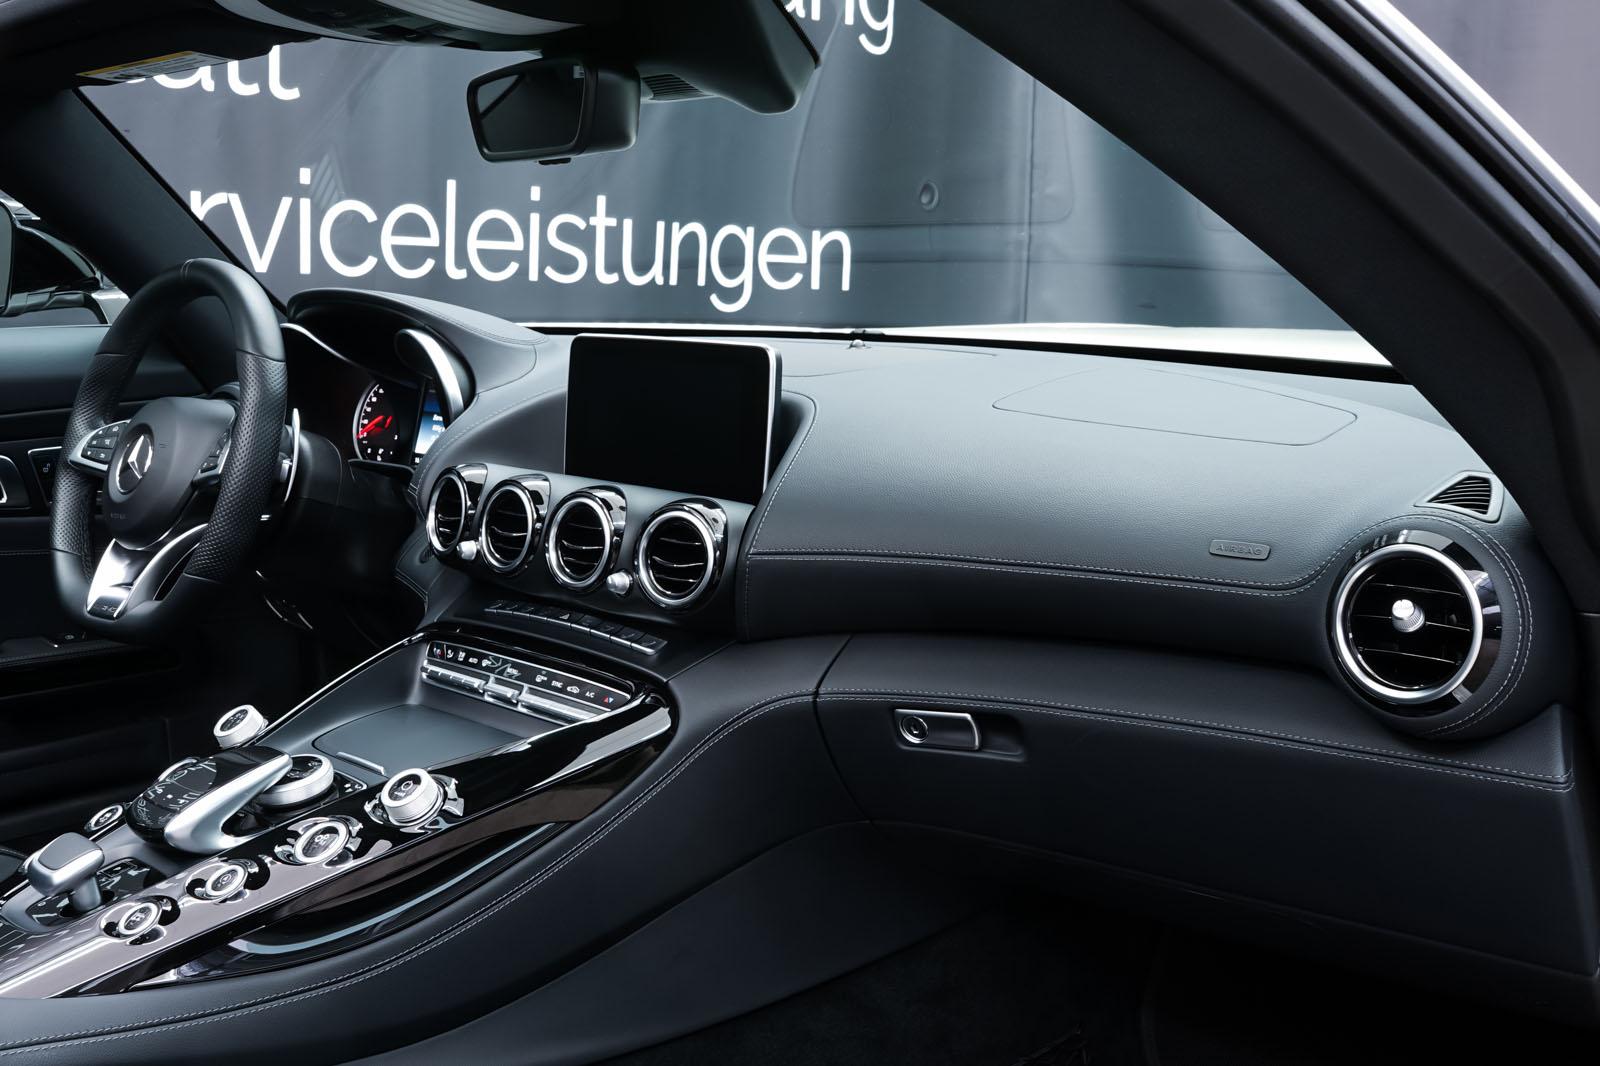 11Mercedes_Benz_AMG_GT_Roadster_Weiss_Schwarz_MB-9710_16_w